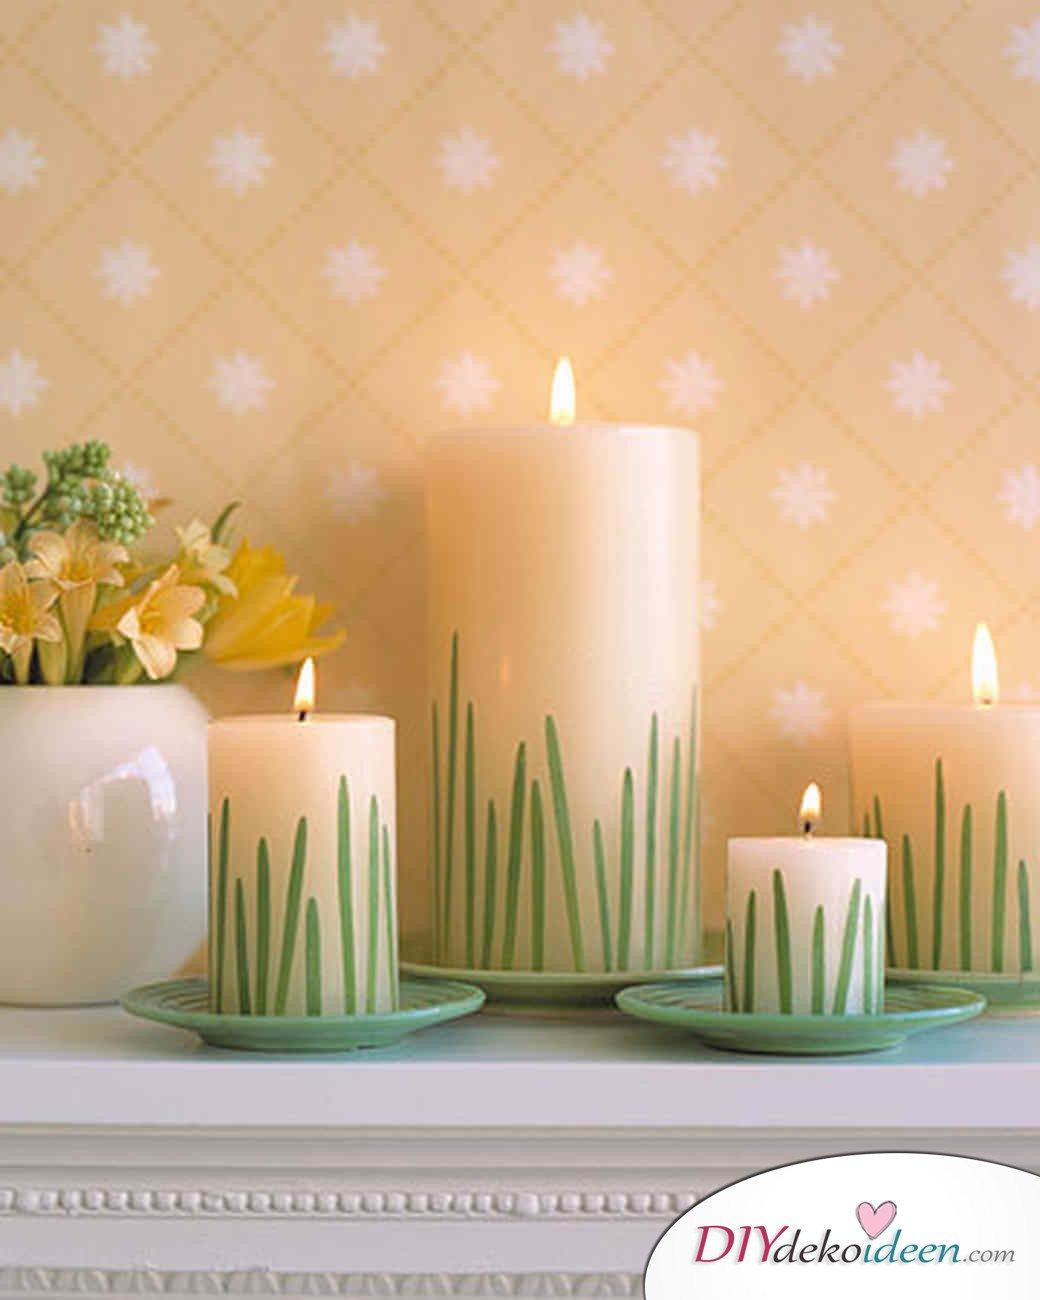 DIY Ideen - Frühlingsdeko selbst gestalten -Grashalm-Kerzen